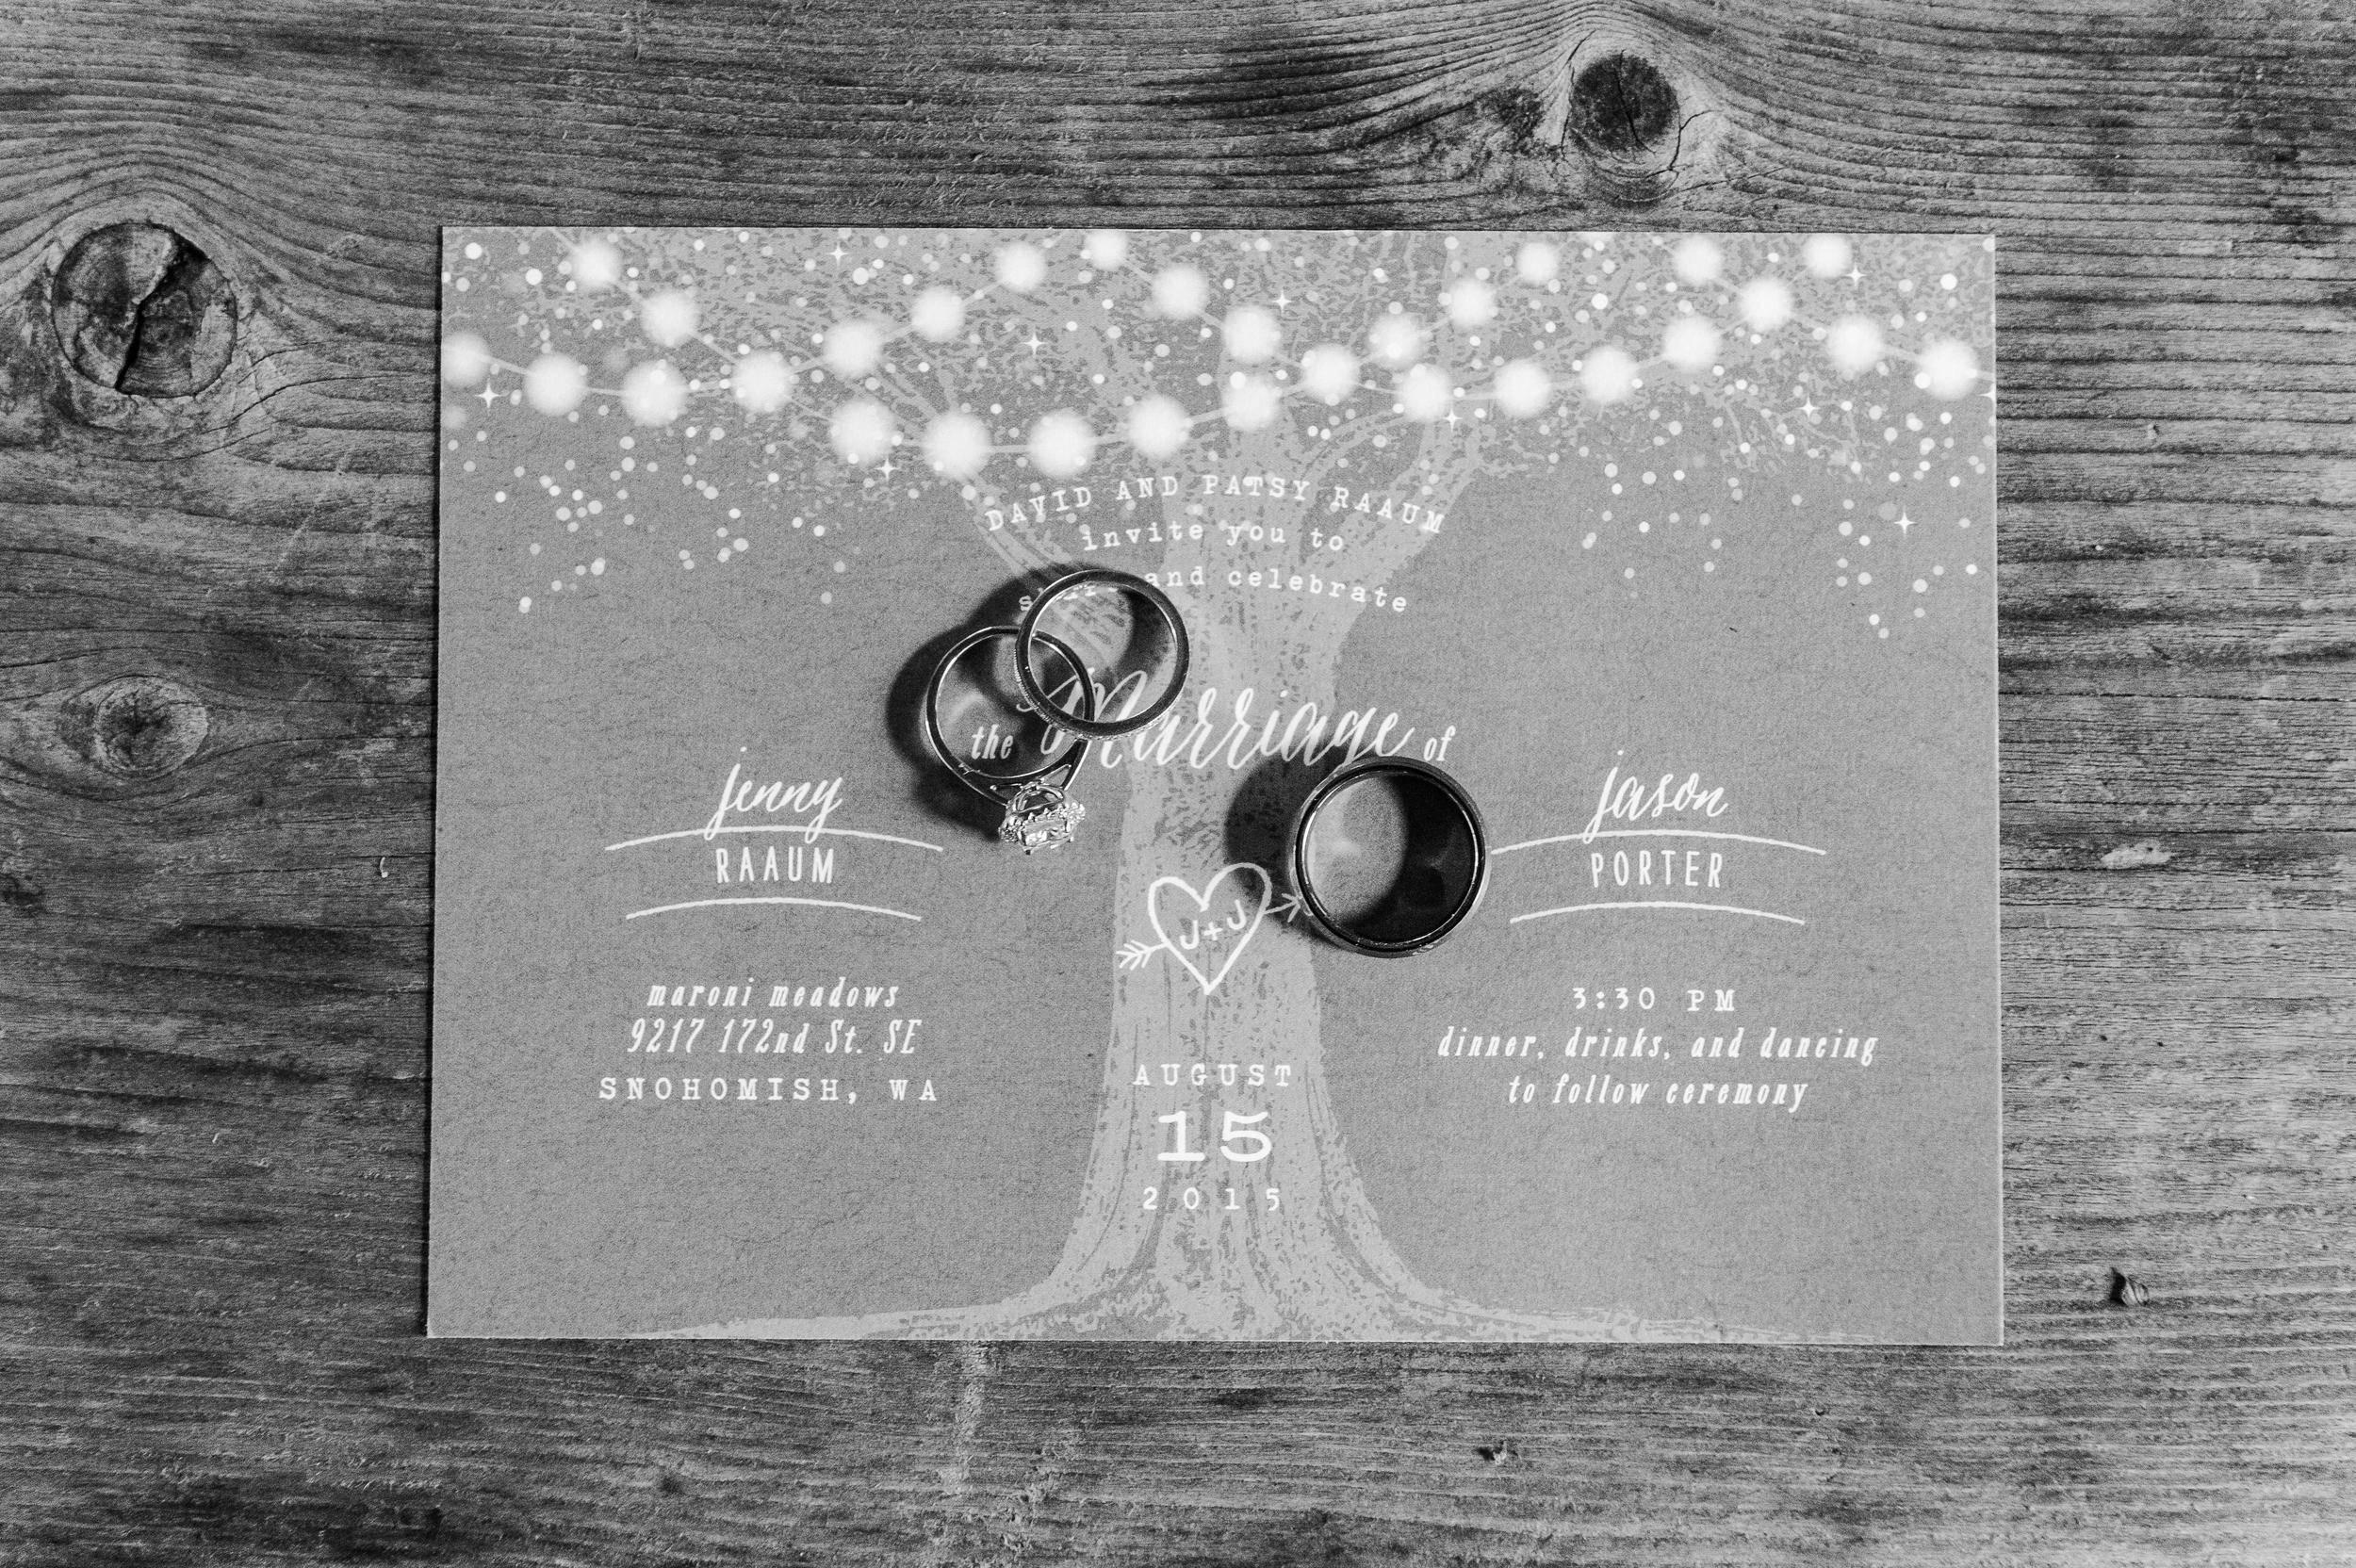 JJ-wedding-Van-Wyhe-Photography-036.jpg